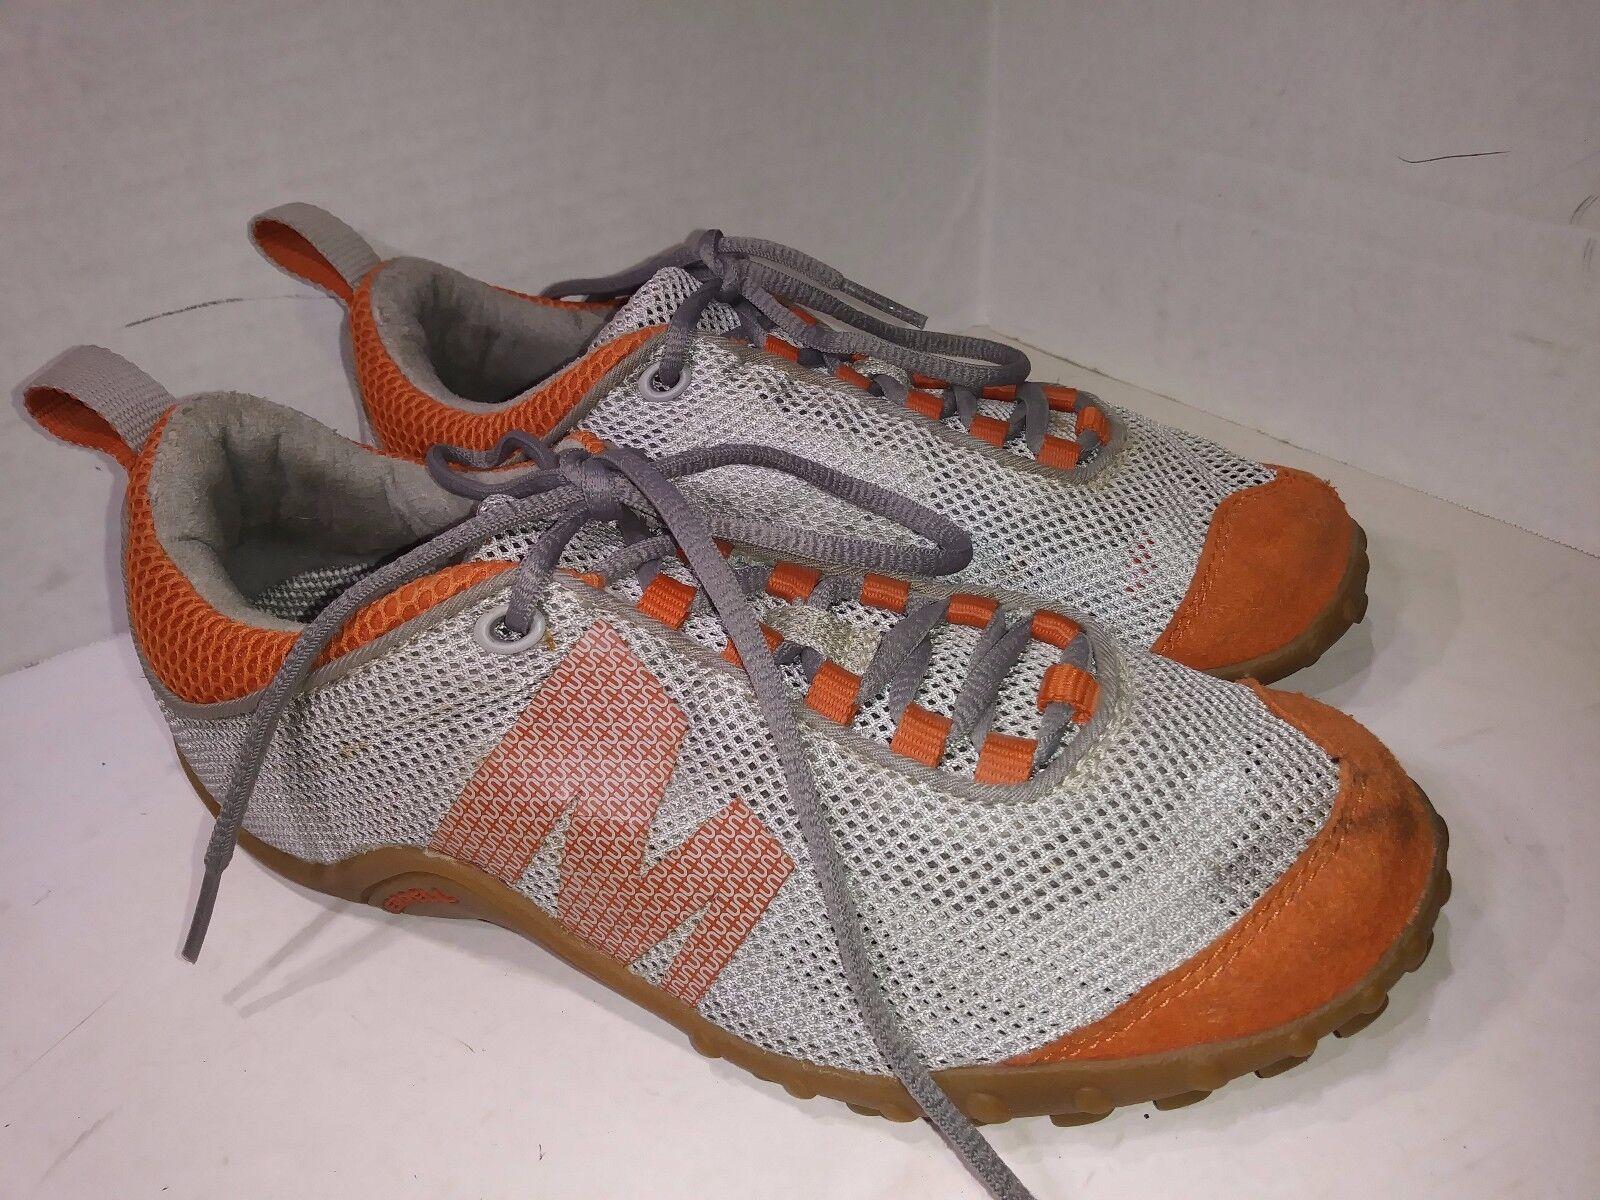 MERRELL SPRINT STREAK VENTILATOR GREY orangeSneakers Womens Size 6.5